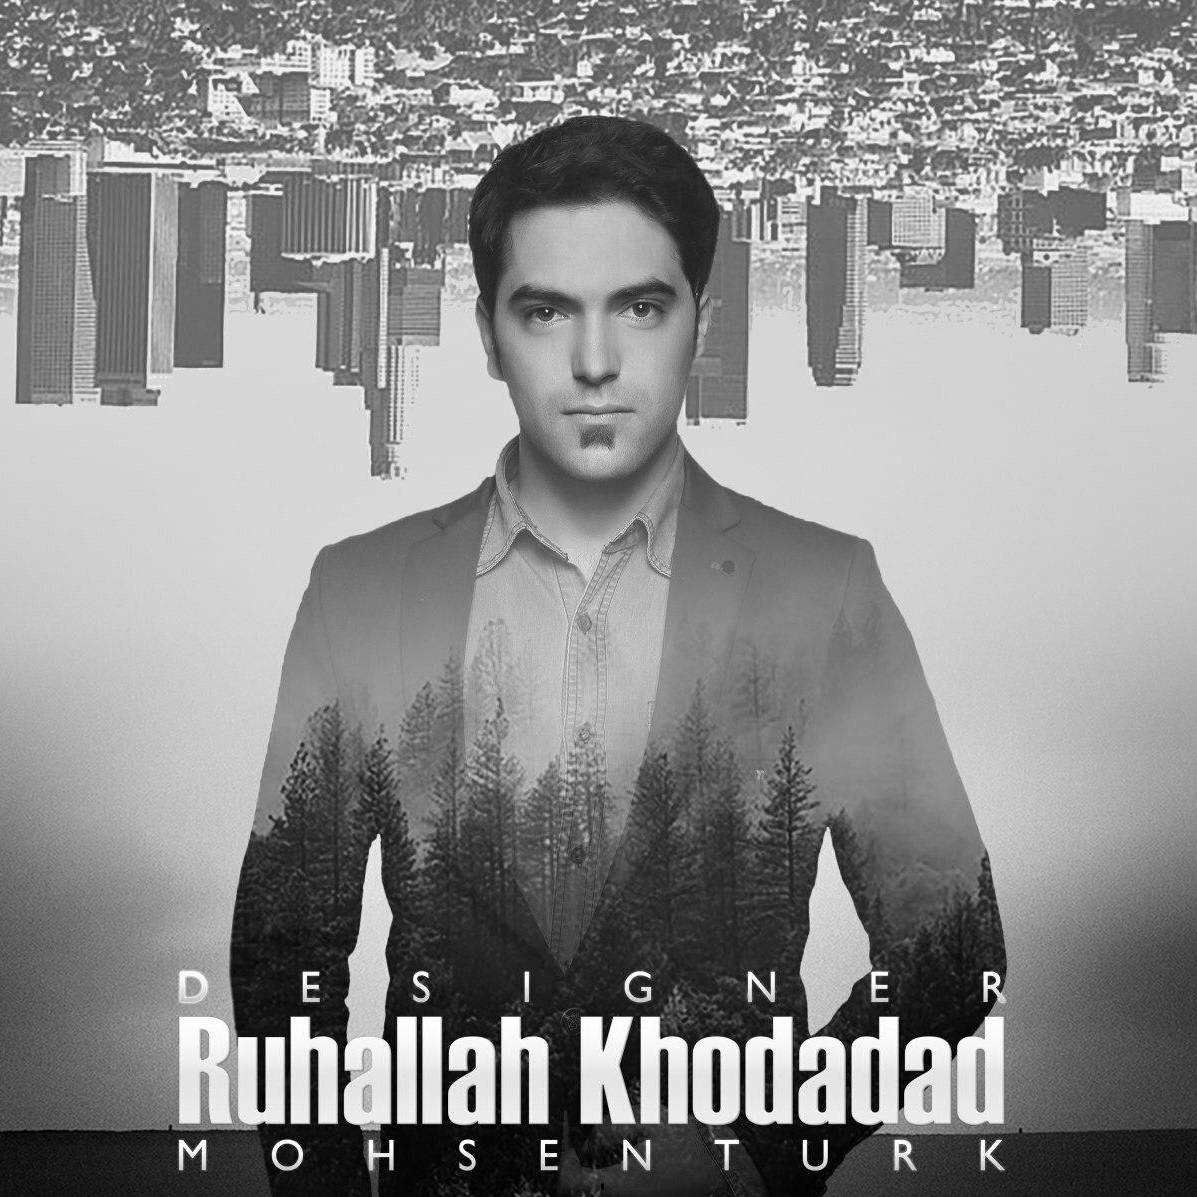 http://s4.picofile.com/file/8364166884/15Ruhallah_Khodadad_Khatirlayarsan.jpg